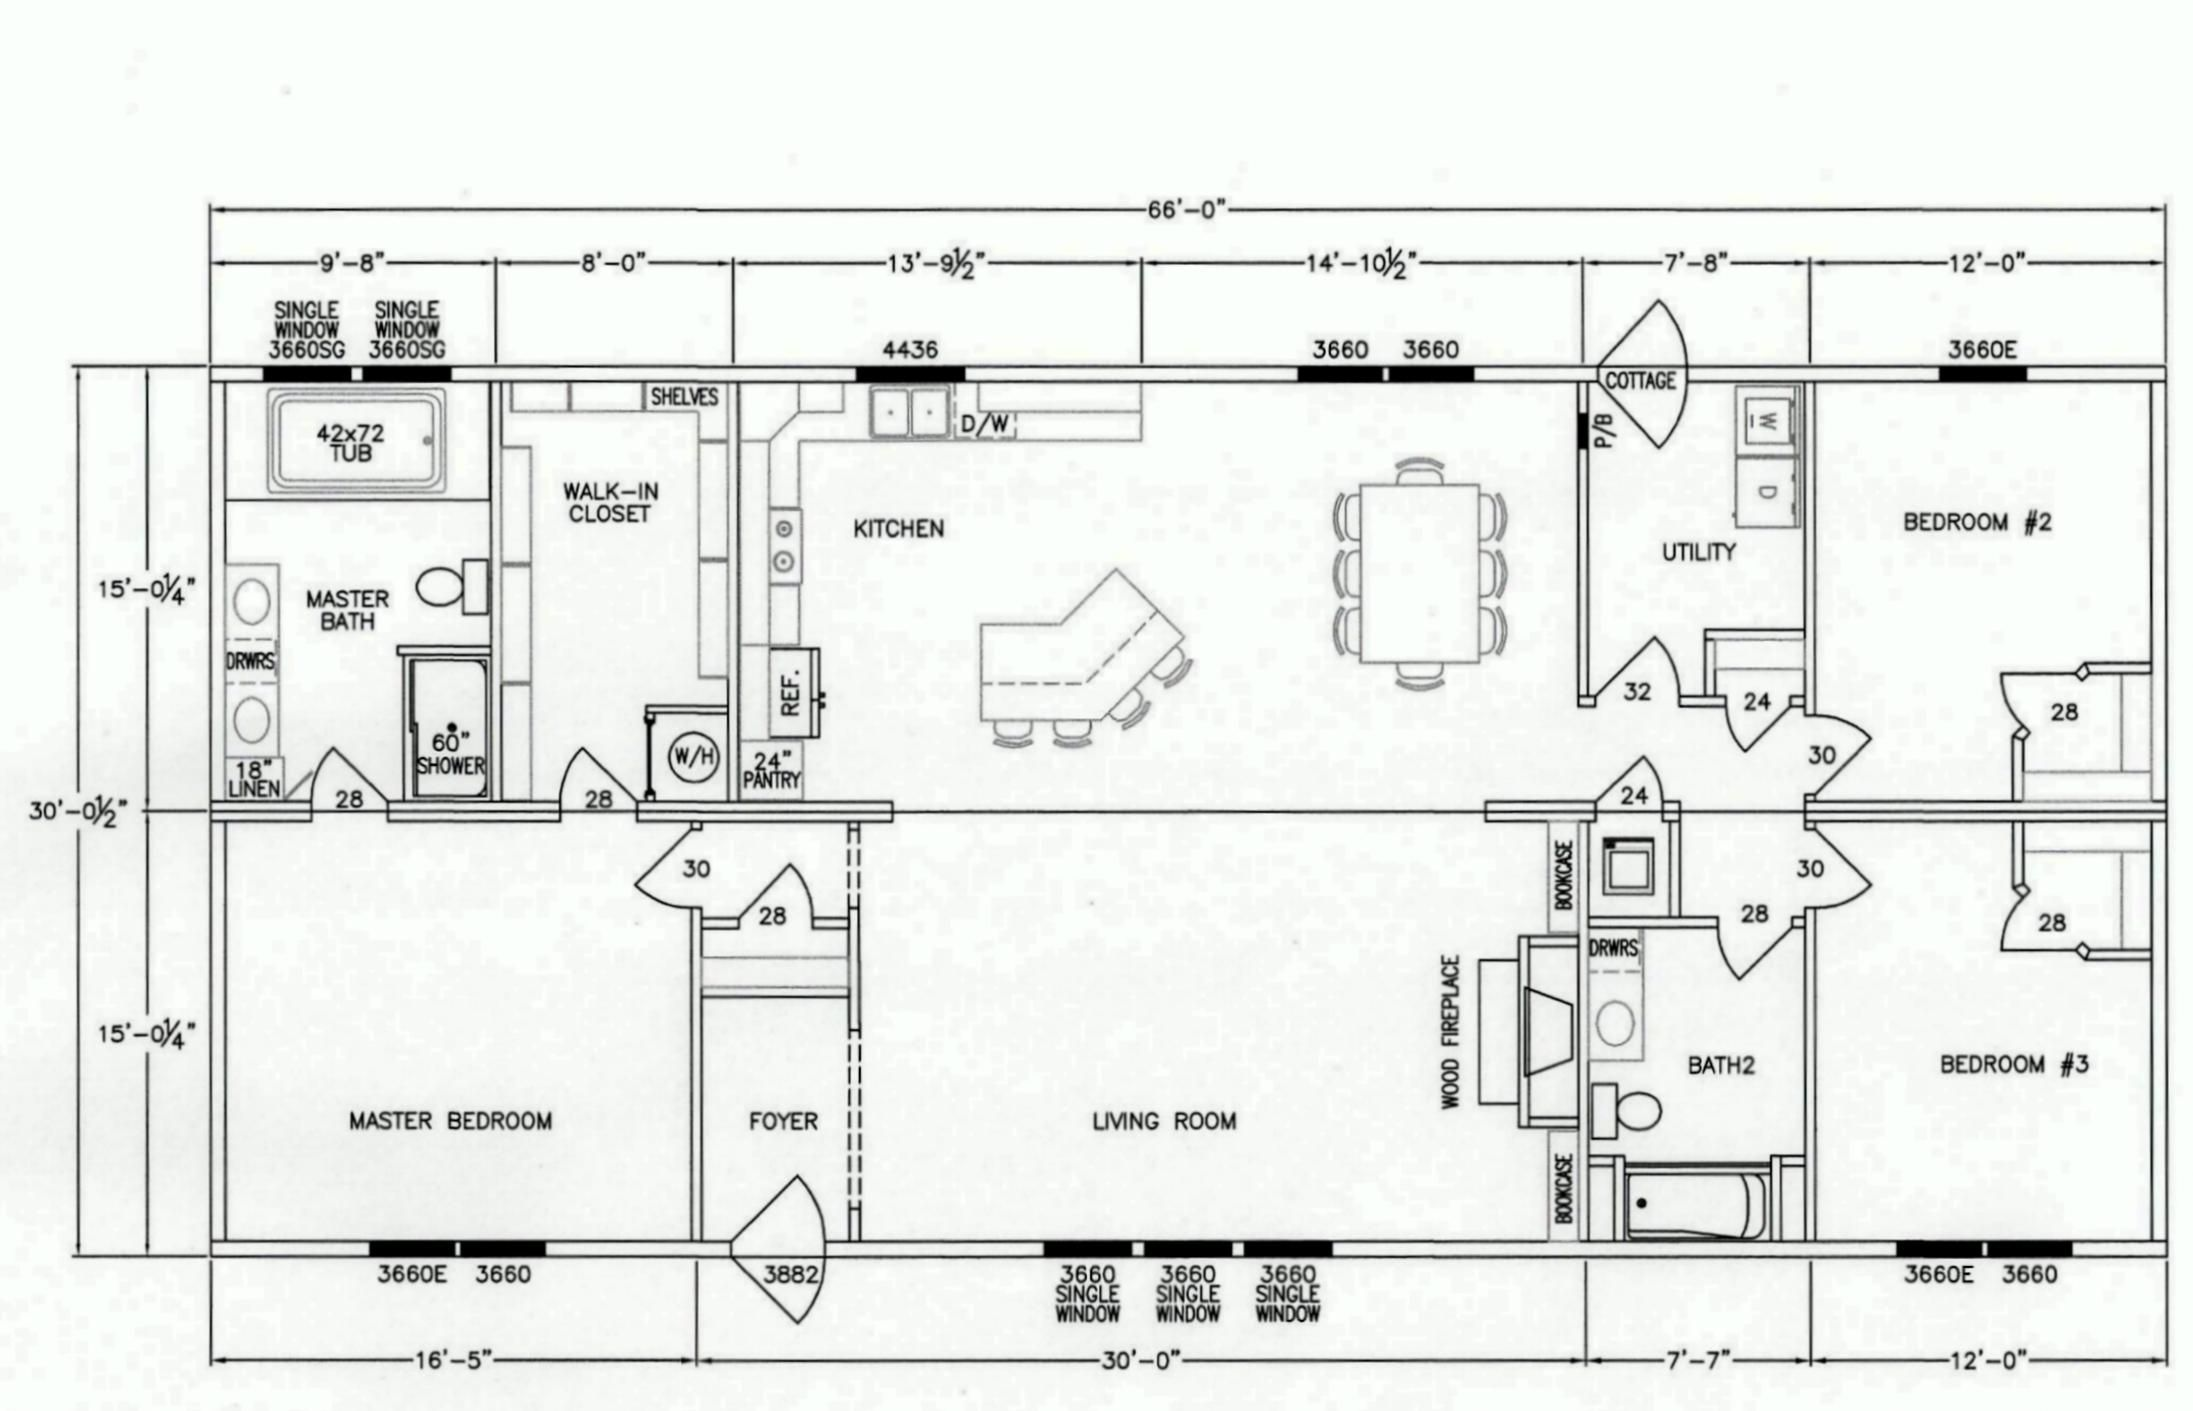 3 Bedroom Floor Plan F1002 3 bedroom floor plan, Floor